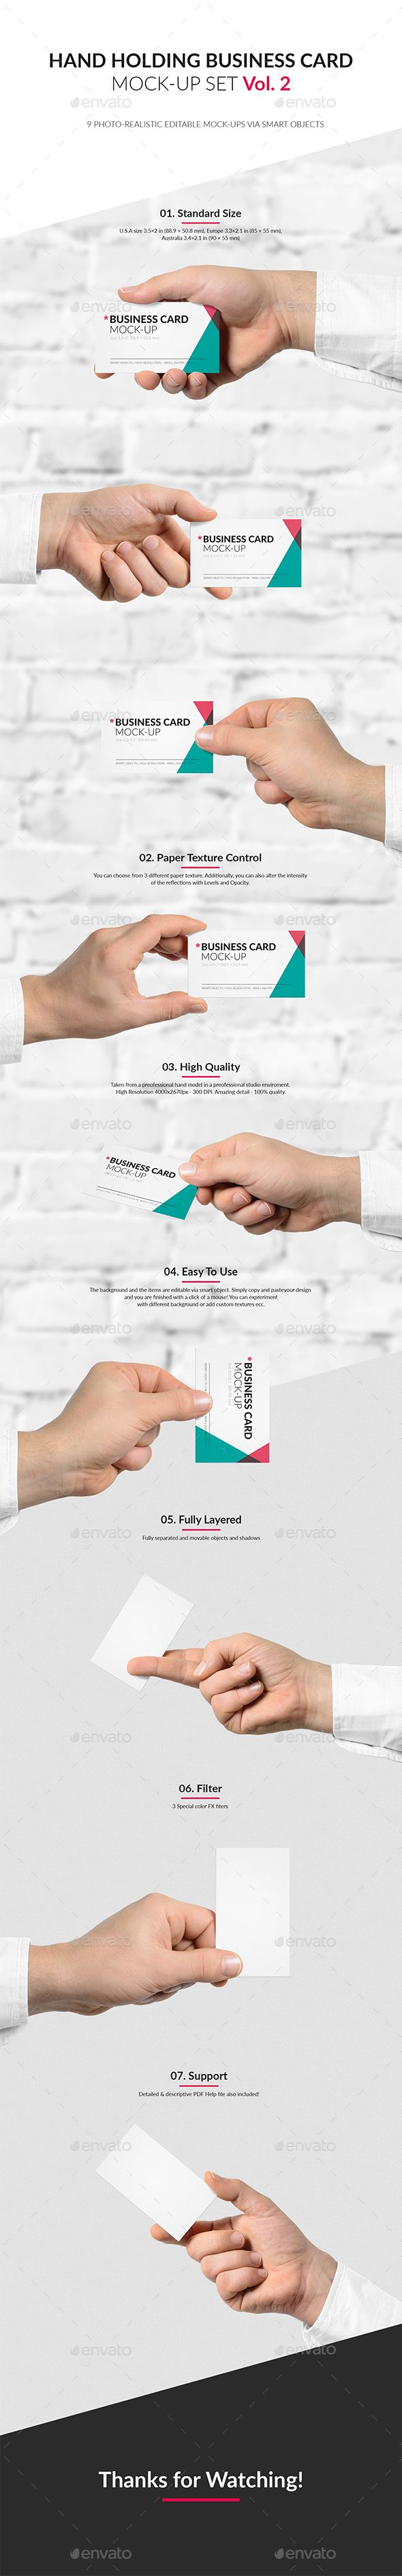 61 best business card mockup images on pinterest hand holding business card mock up set vol2 colourmoves